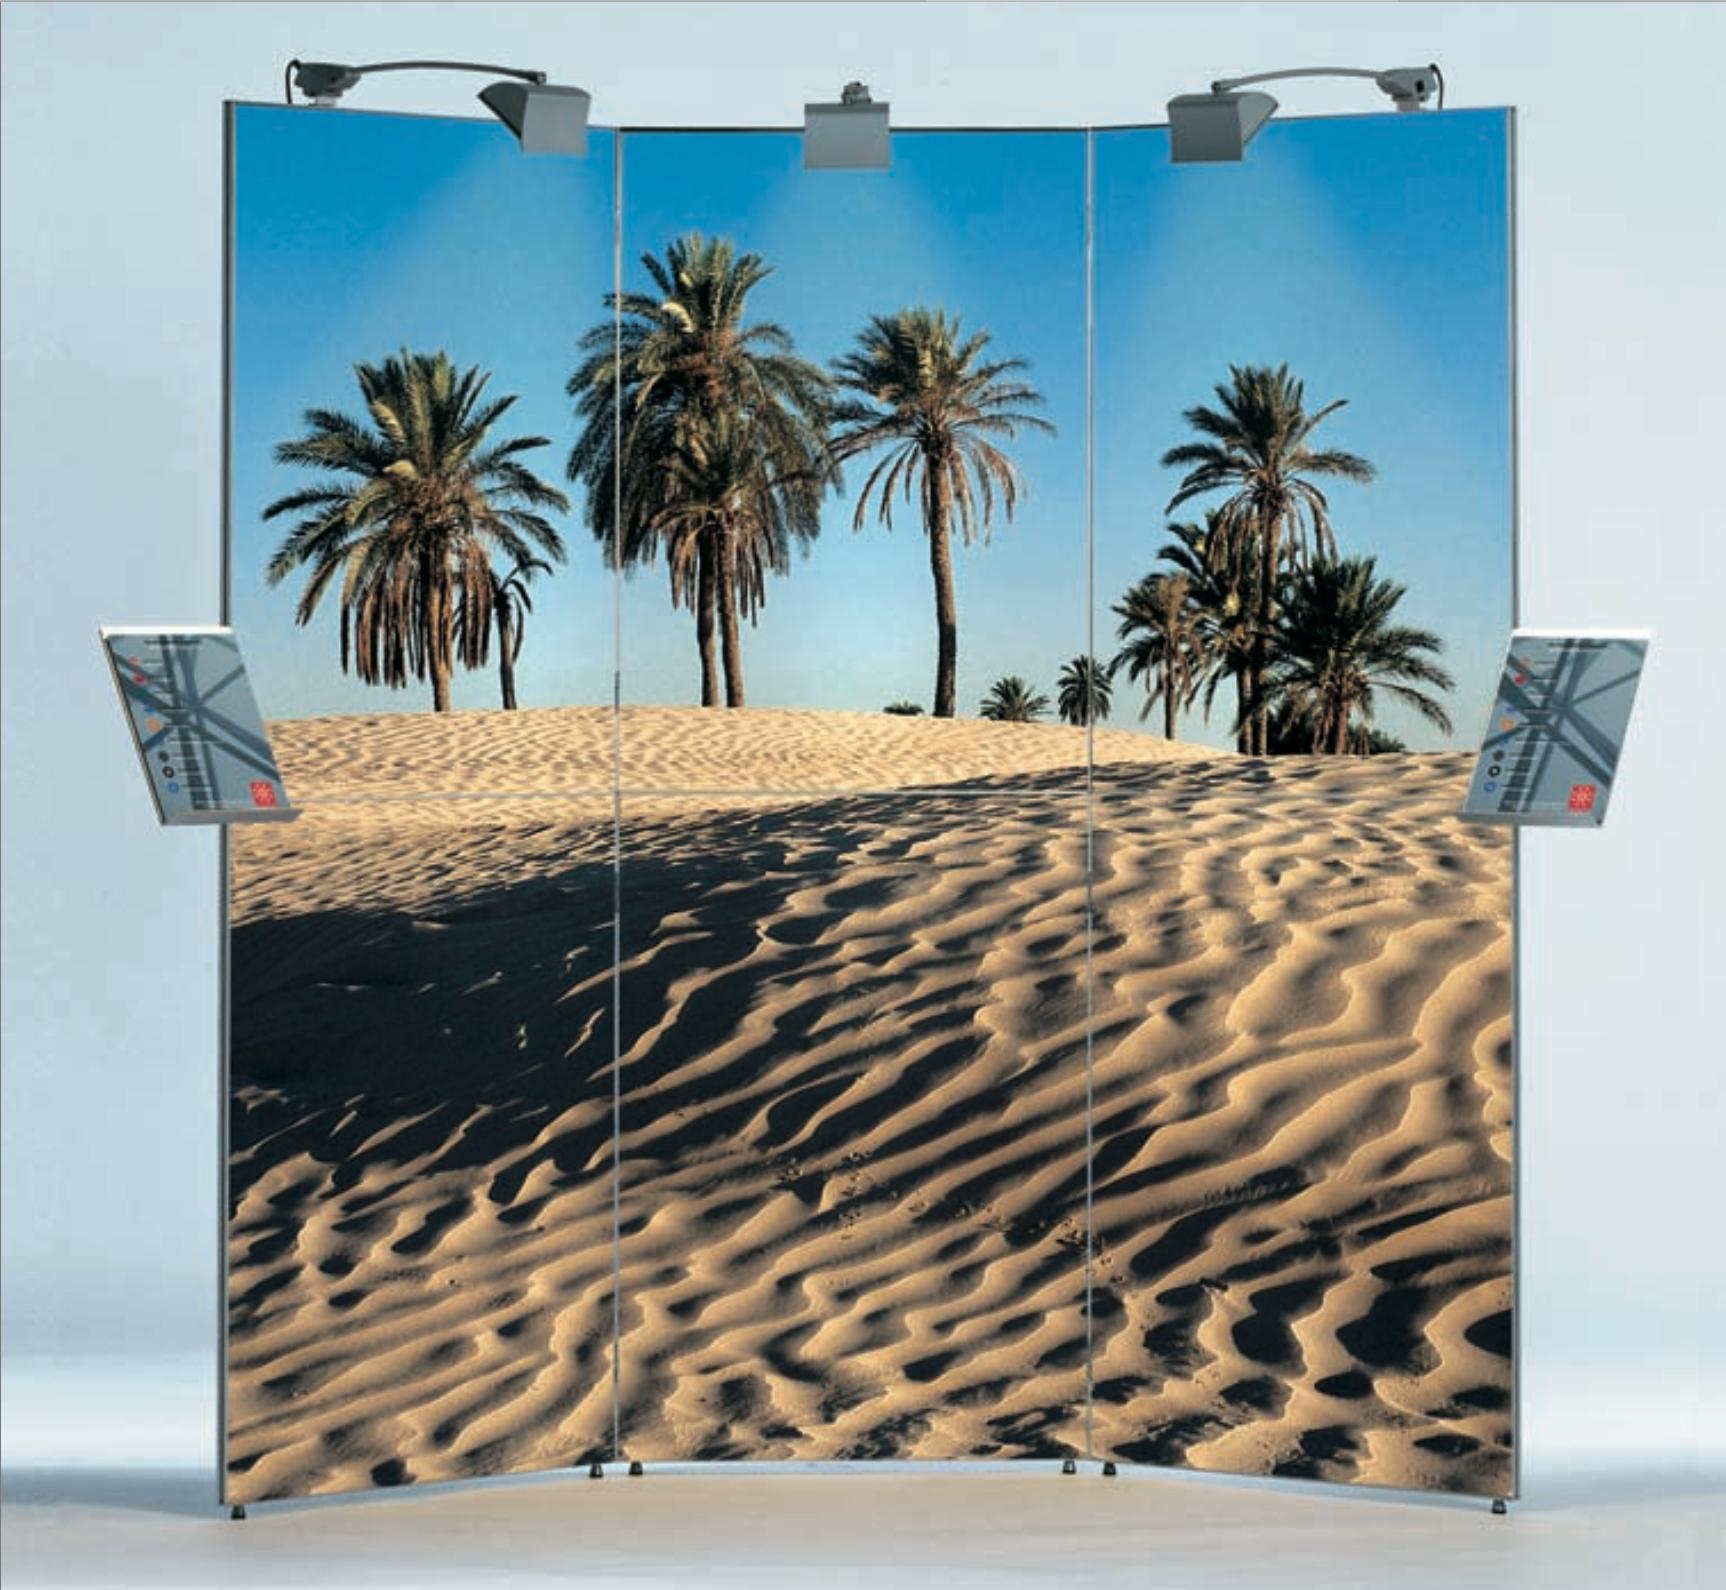 Vario D1 Panel Display